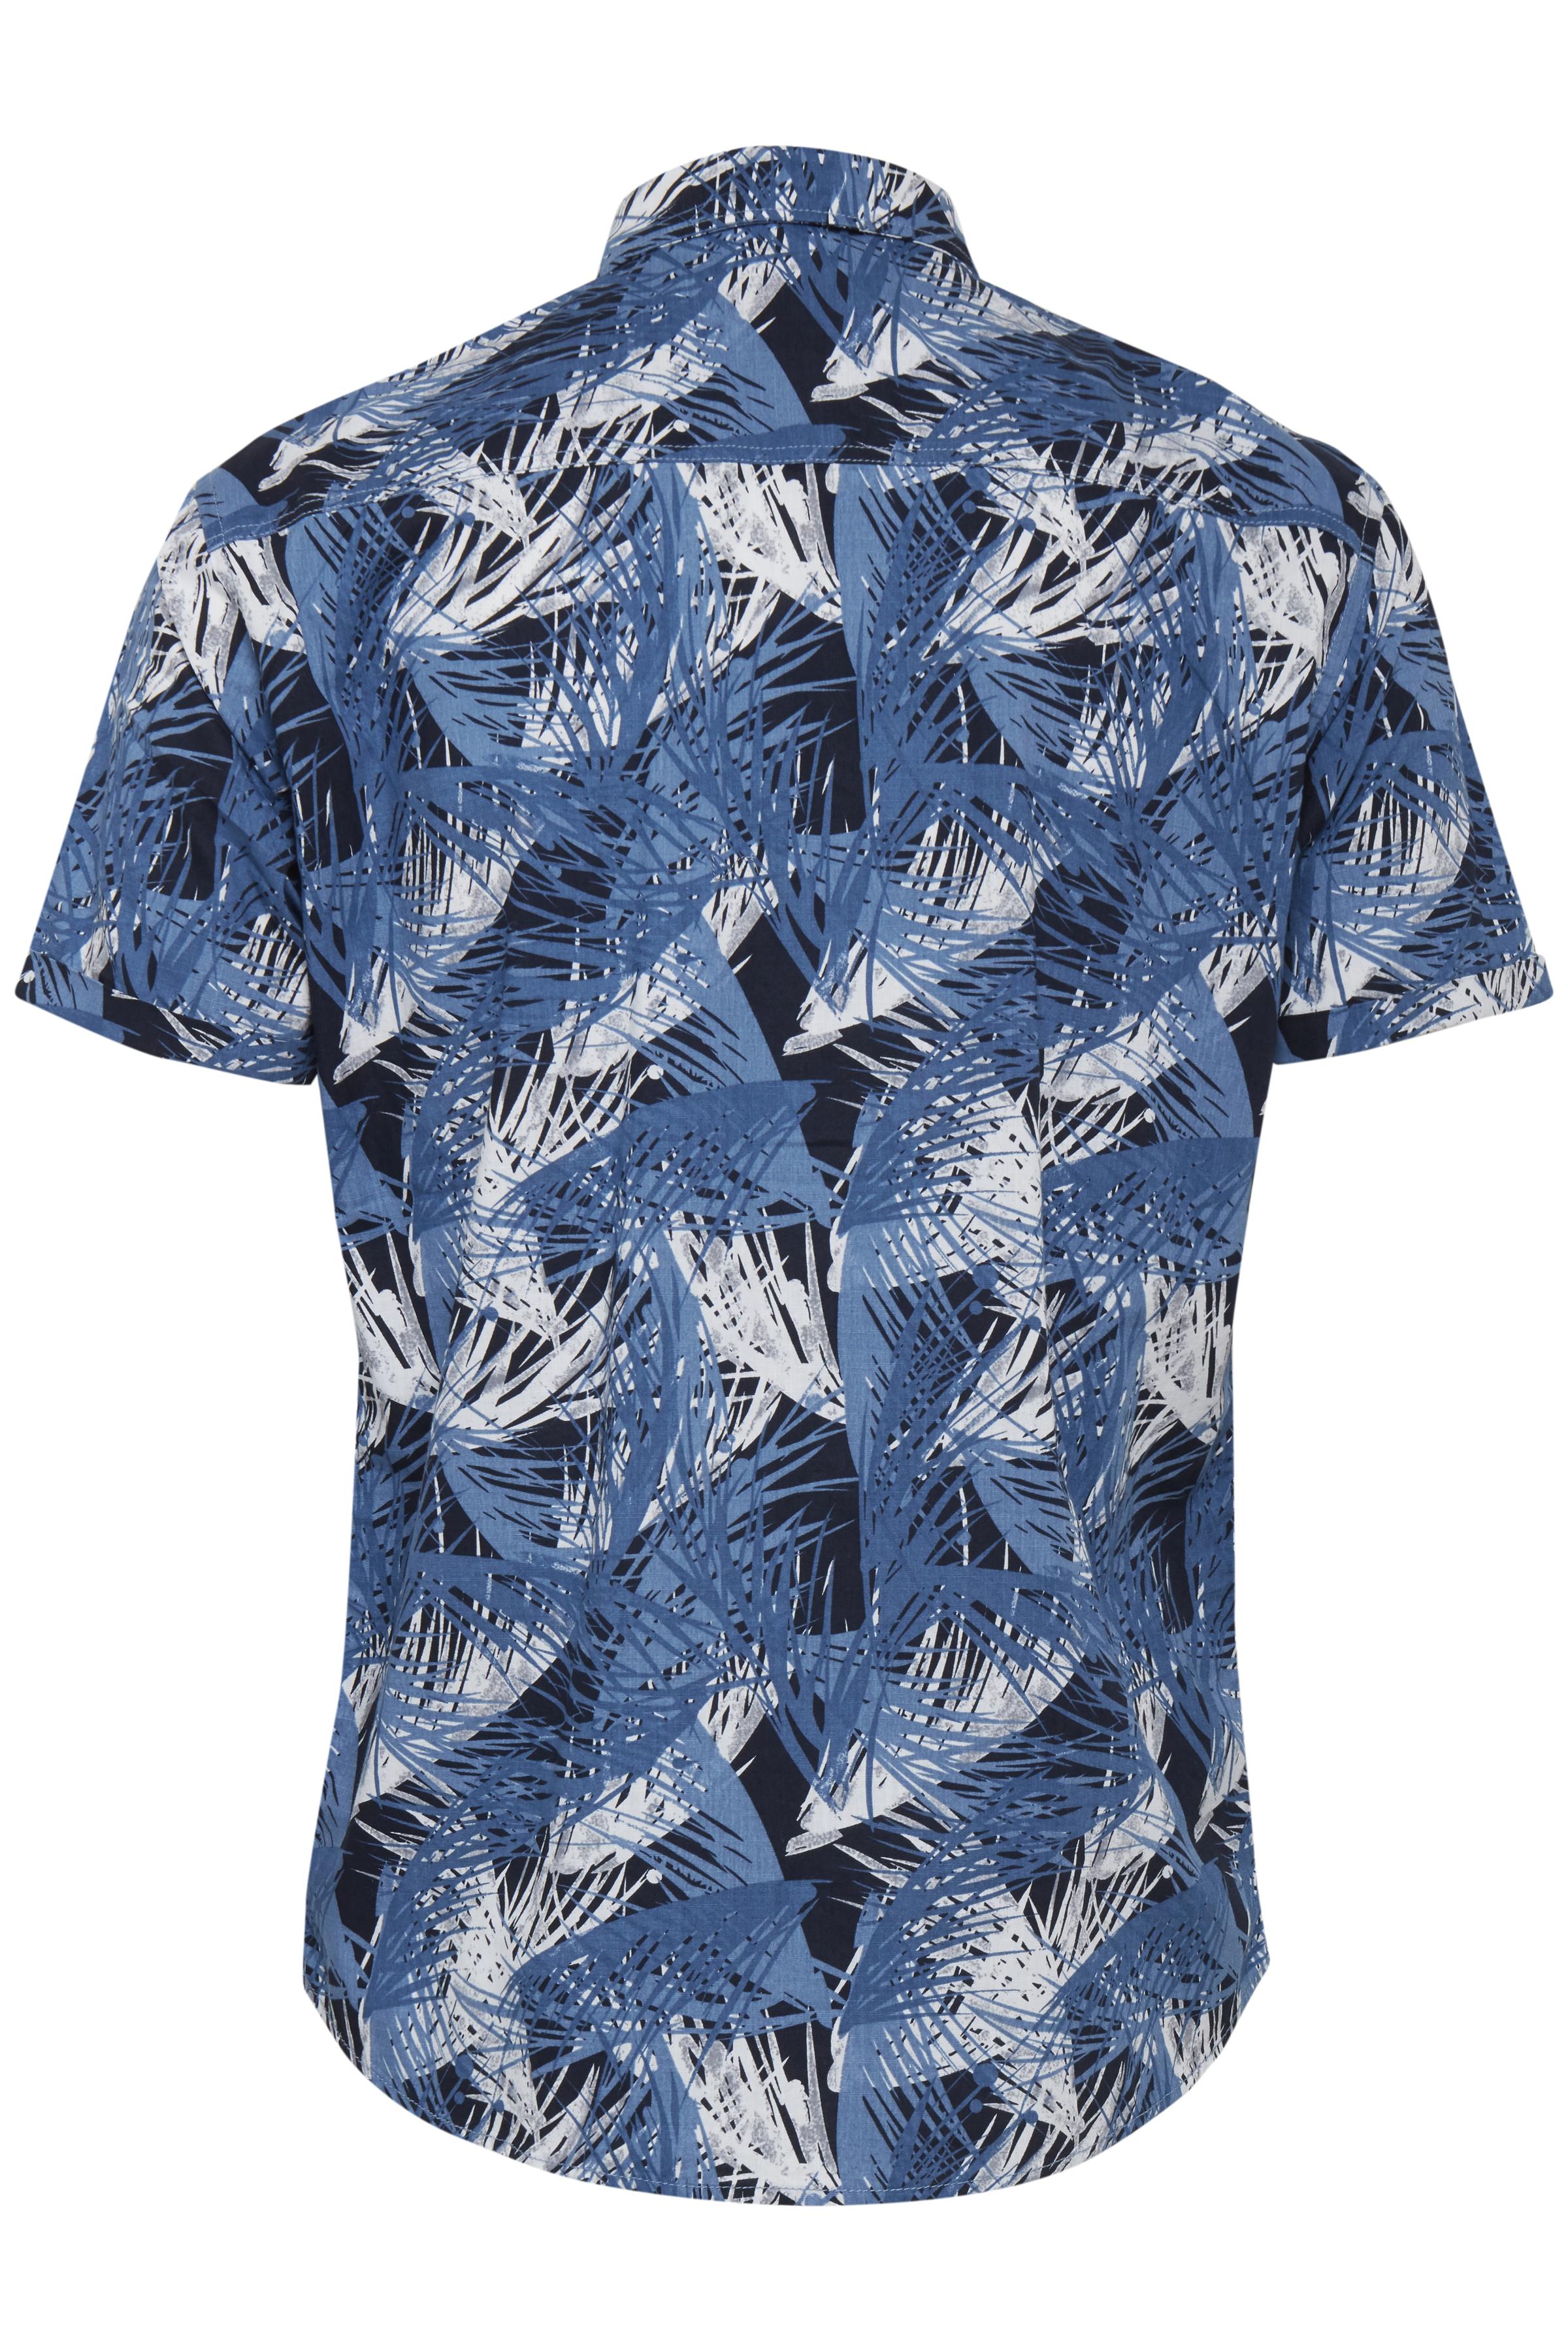 Dark Navy Blue Skjorte – Køb Dark Navy Blue Skjorte fra str. S-3XL her